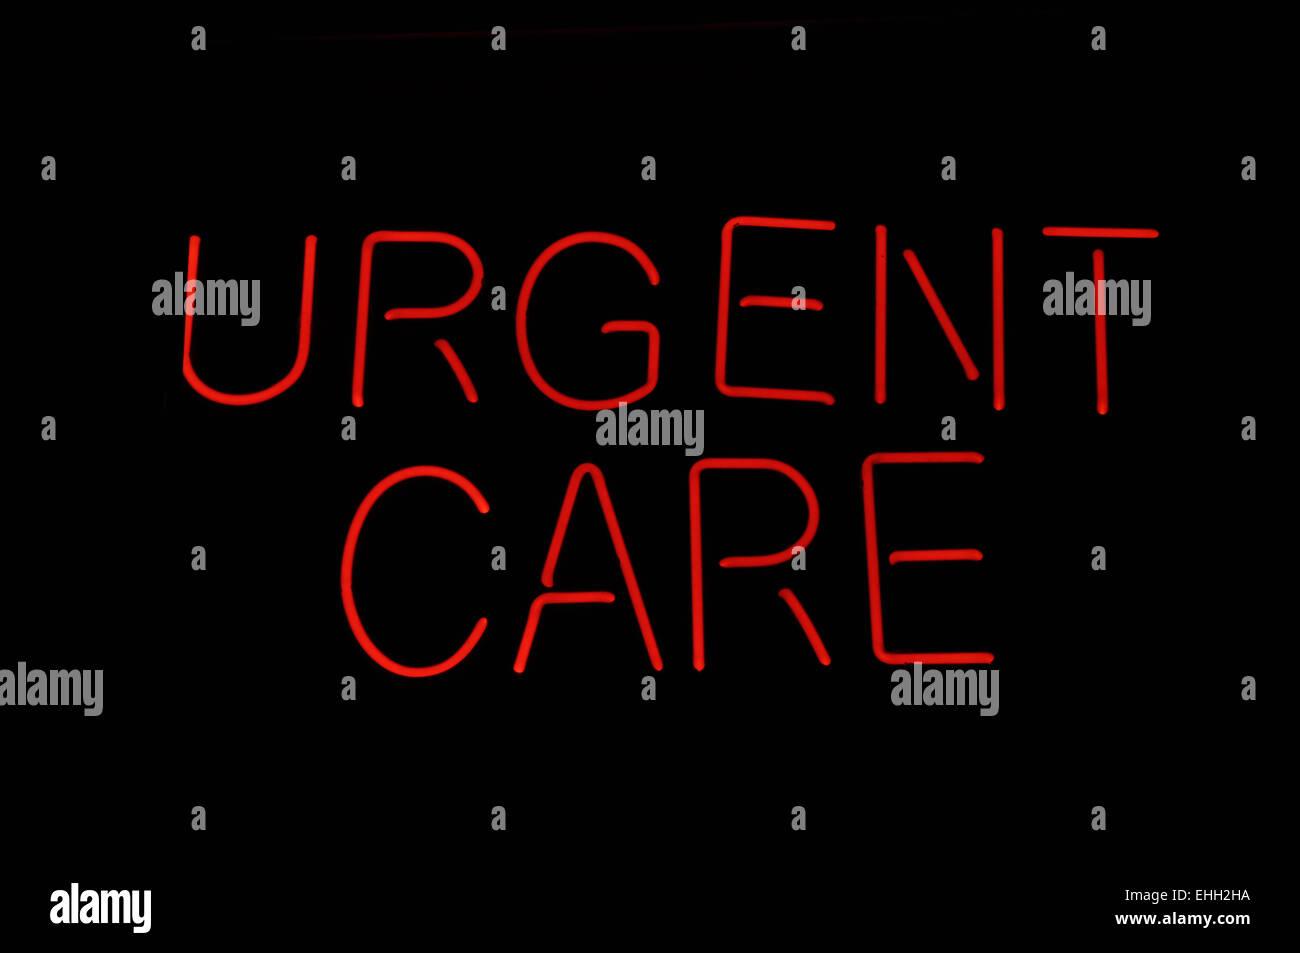 Urgent Care Medical Sign - Stock Image